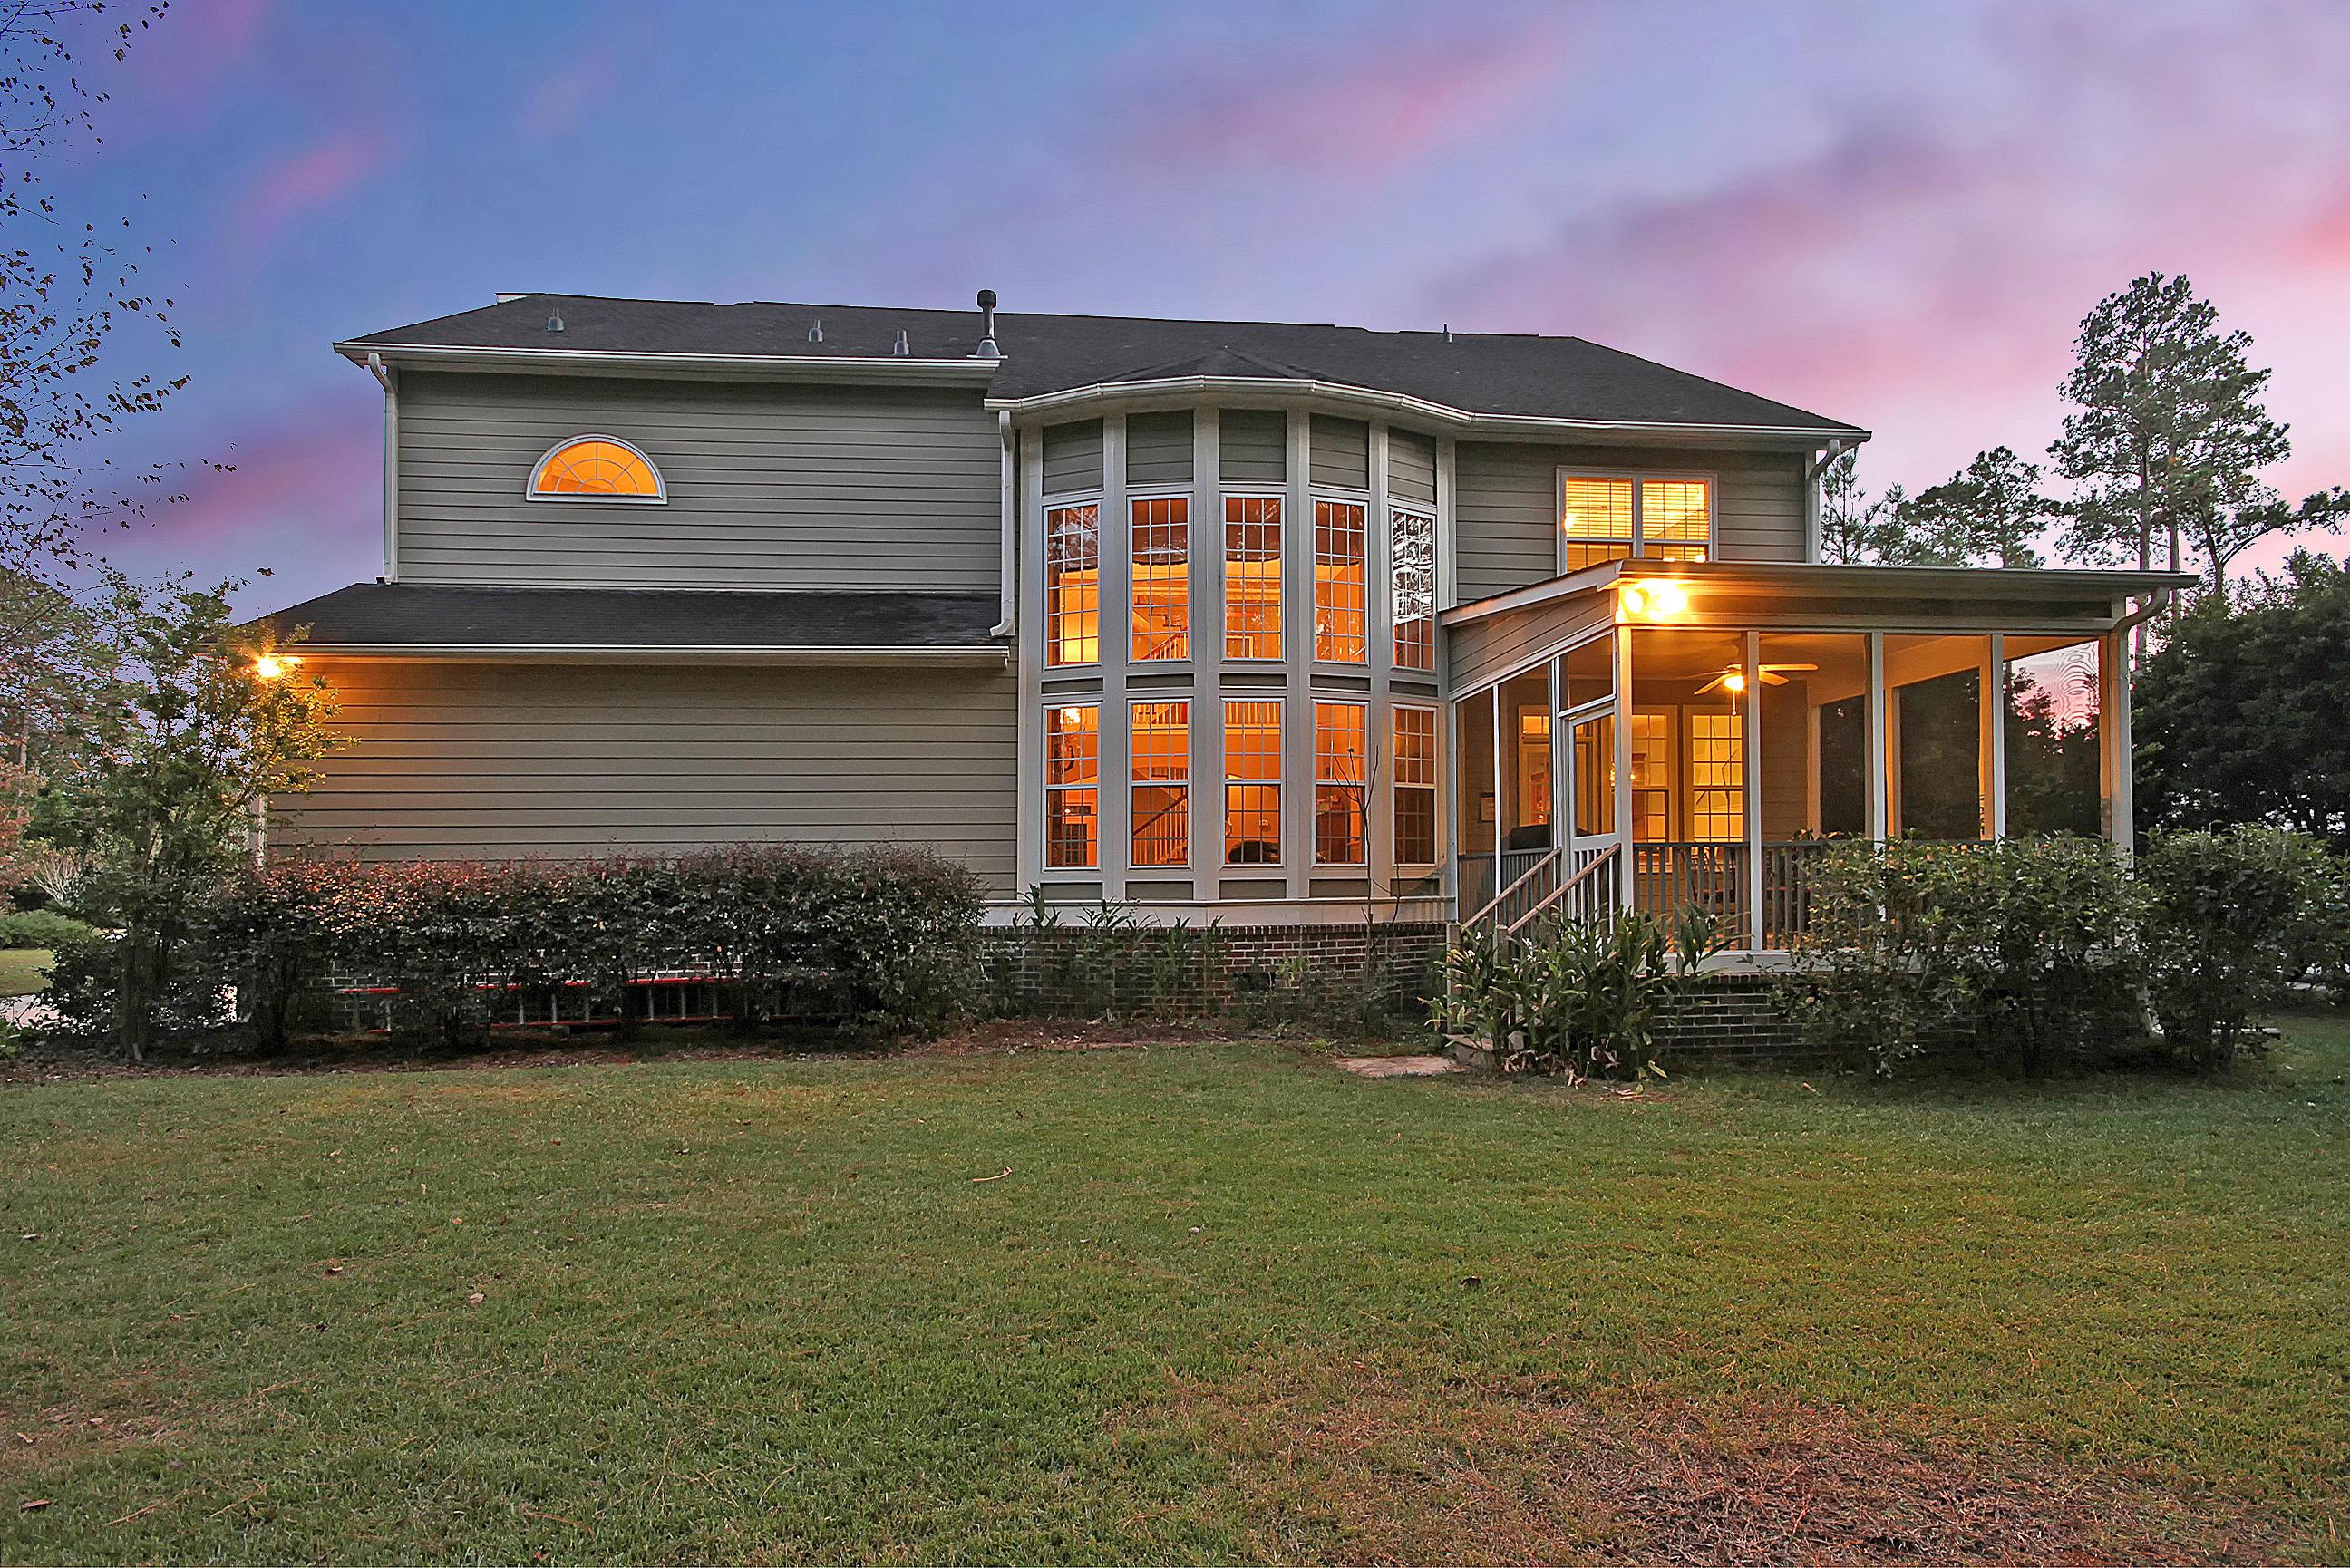 Dunes West Homes For Sale - 2449 Darts Cove, Mount Pleasant, SC - 43